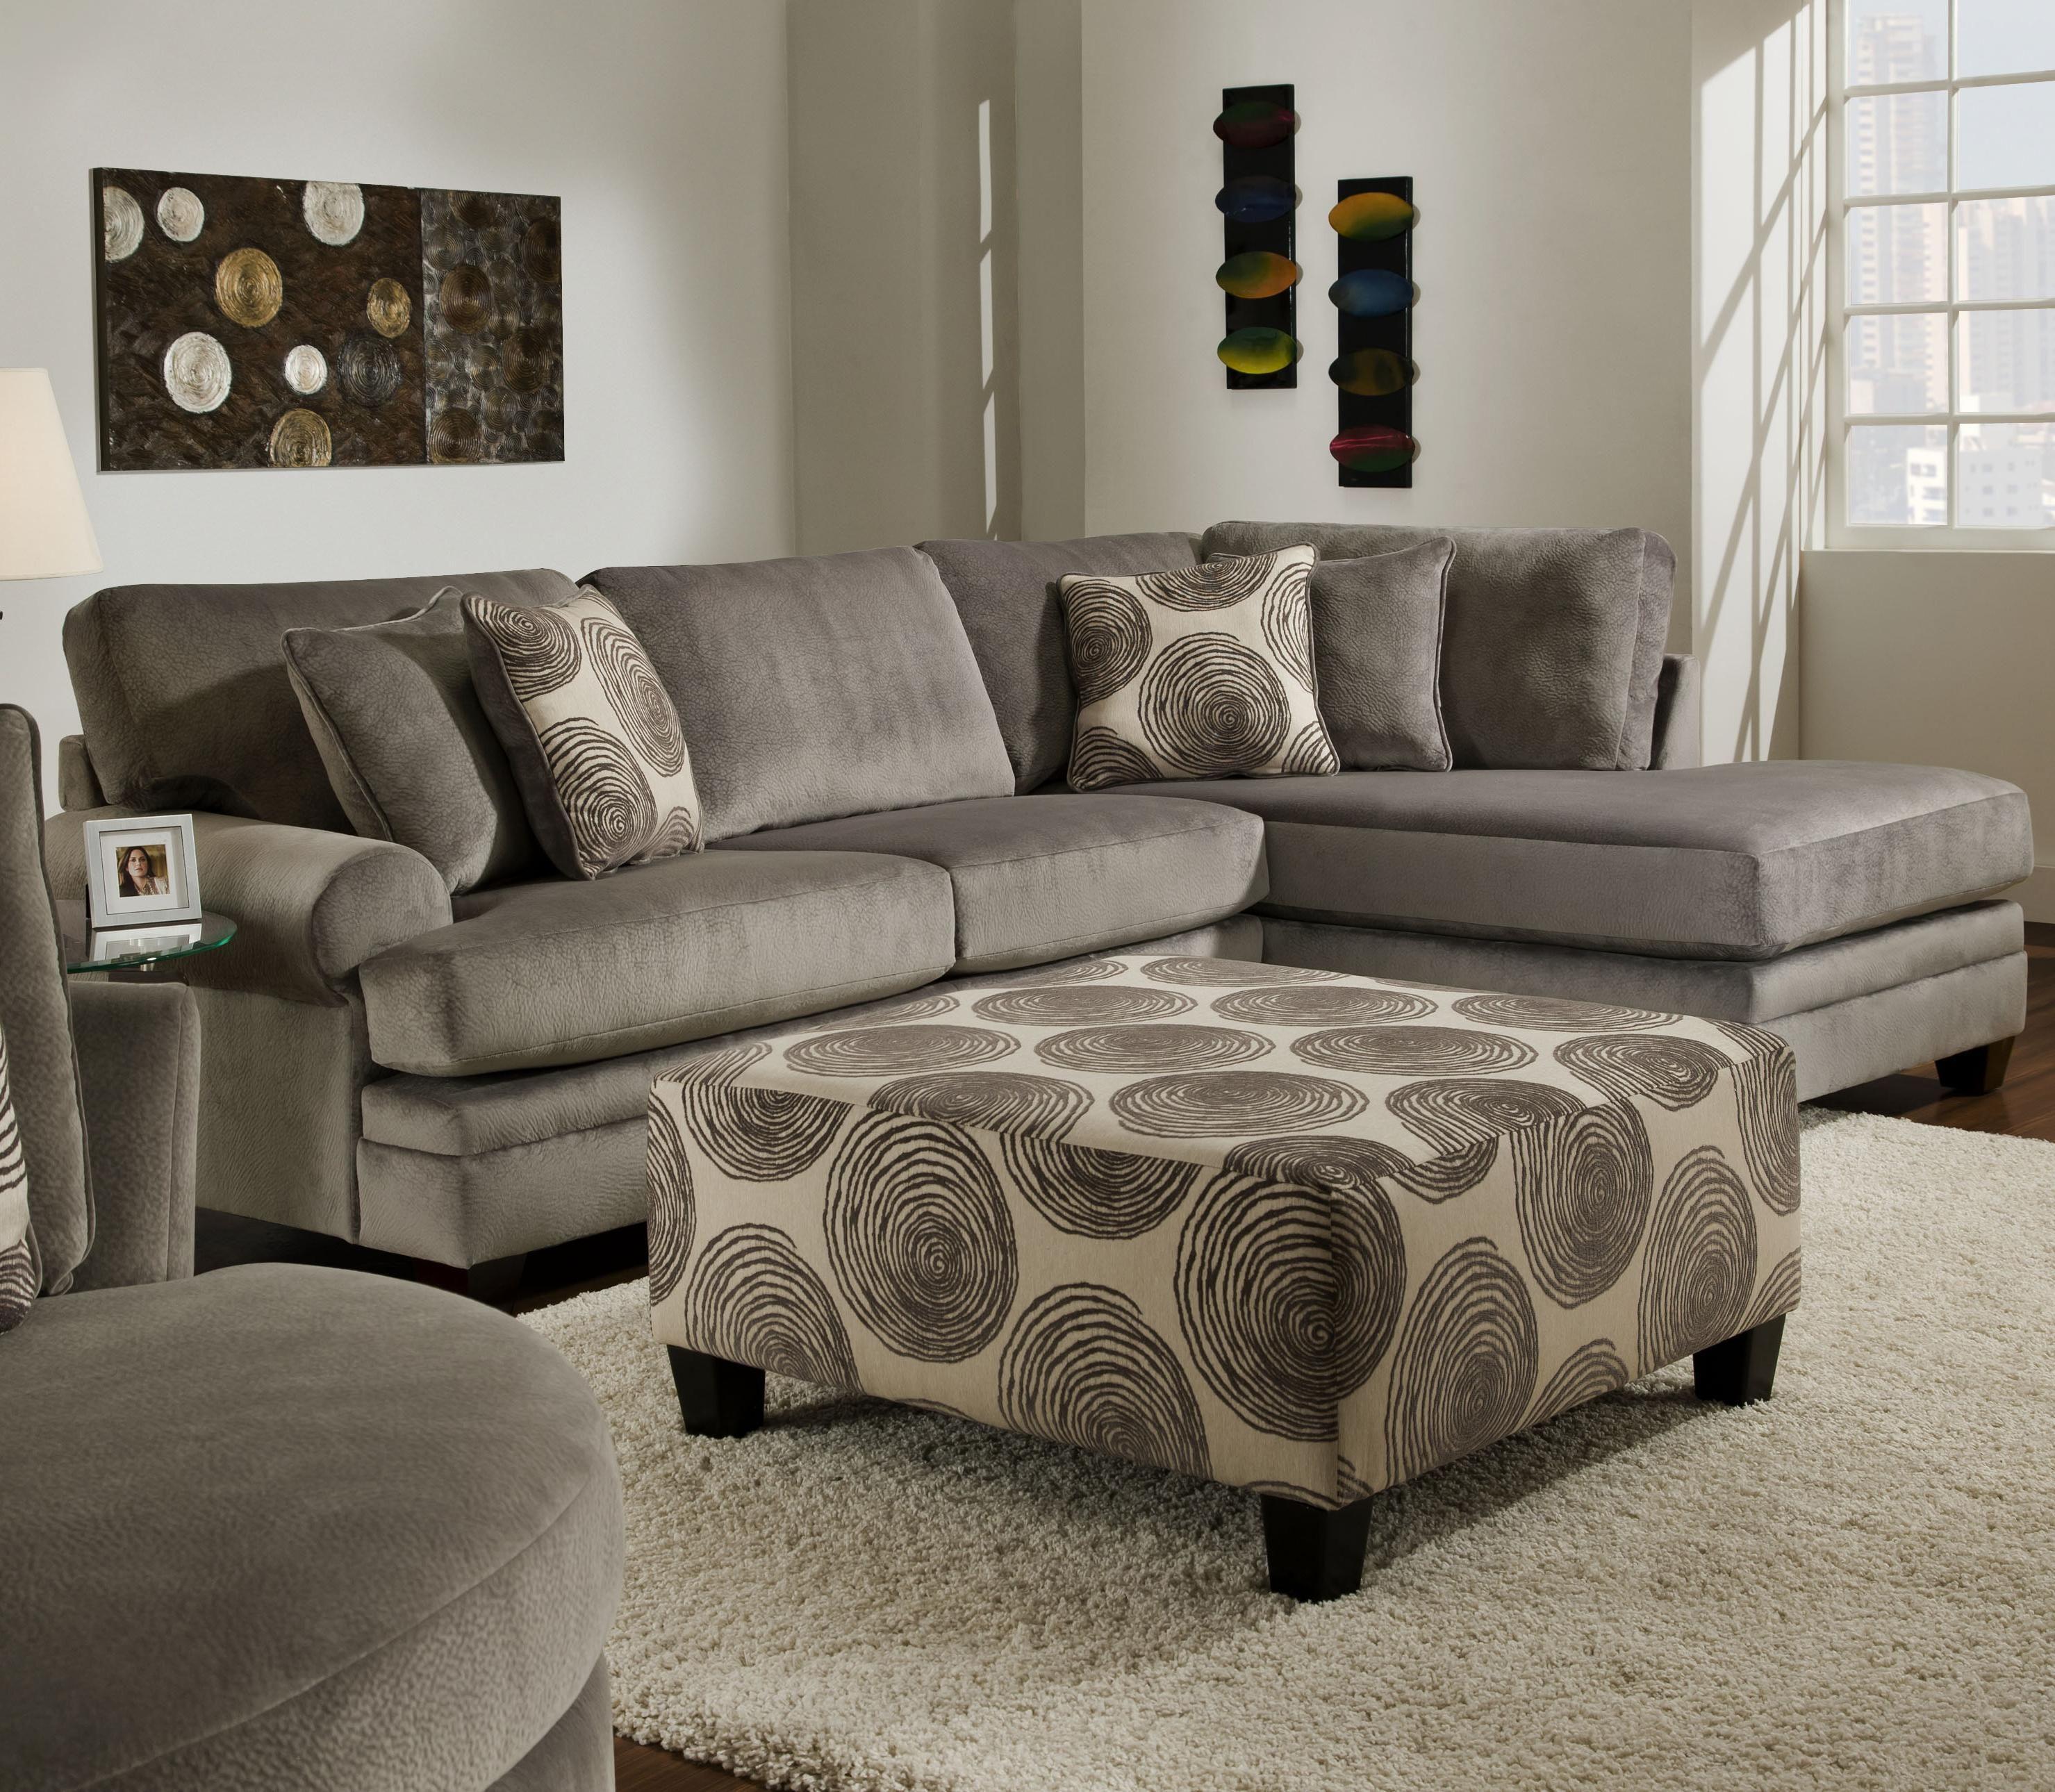 8642 Sectional By Albany $899.00 @ Oshkosh Furniture U0026 Appliance Mart